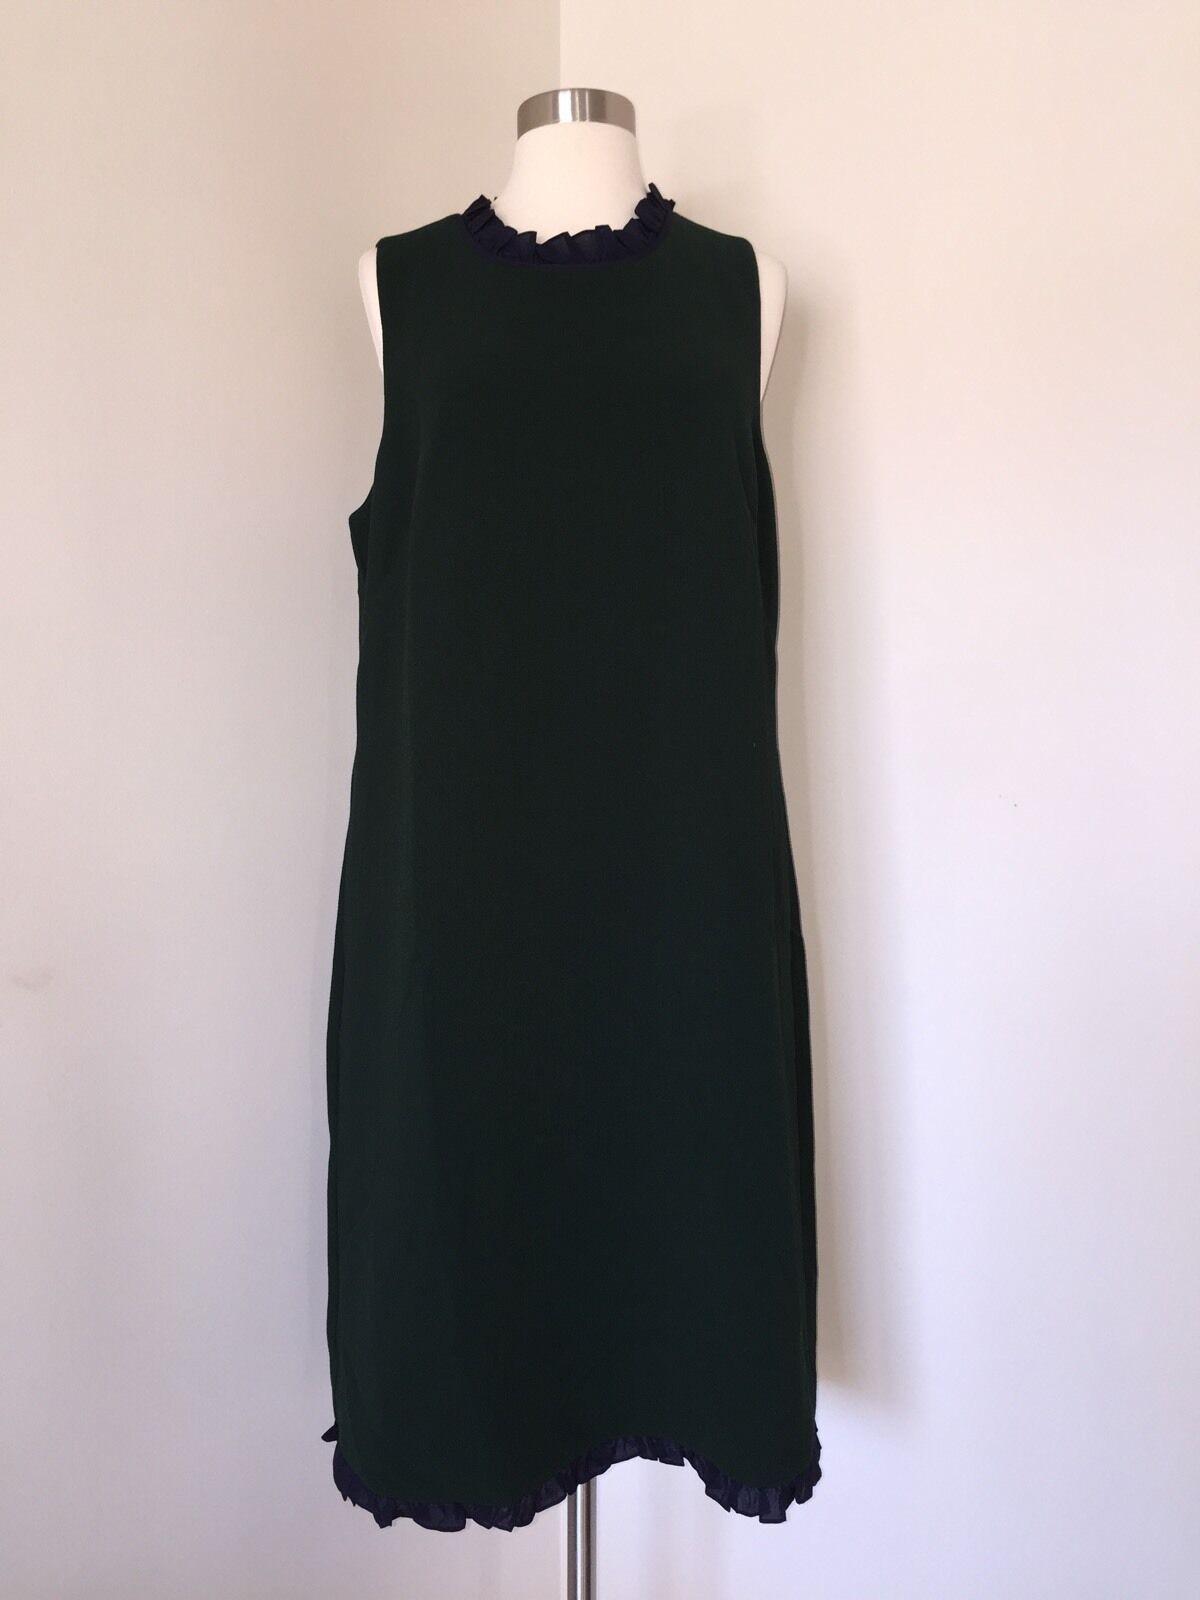 JCrew Tall Ruffle Trim Shift Dress Dark Forest Green Green Green 16T NWT G0321  128 NEW c7e223